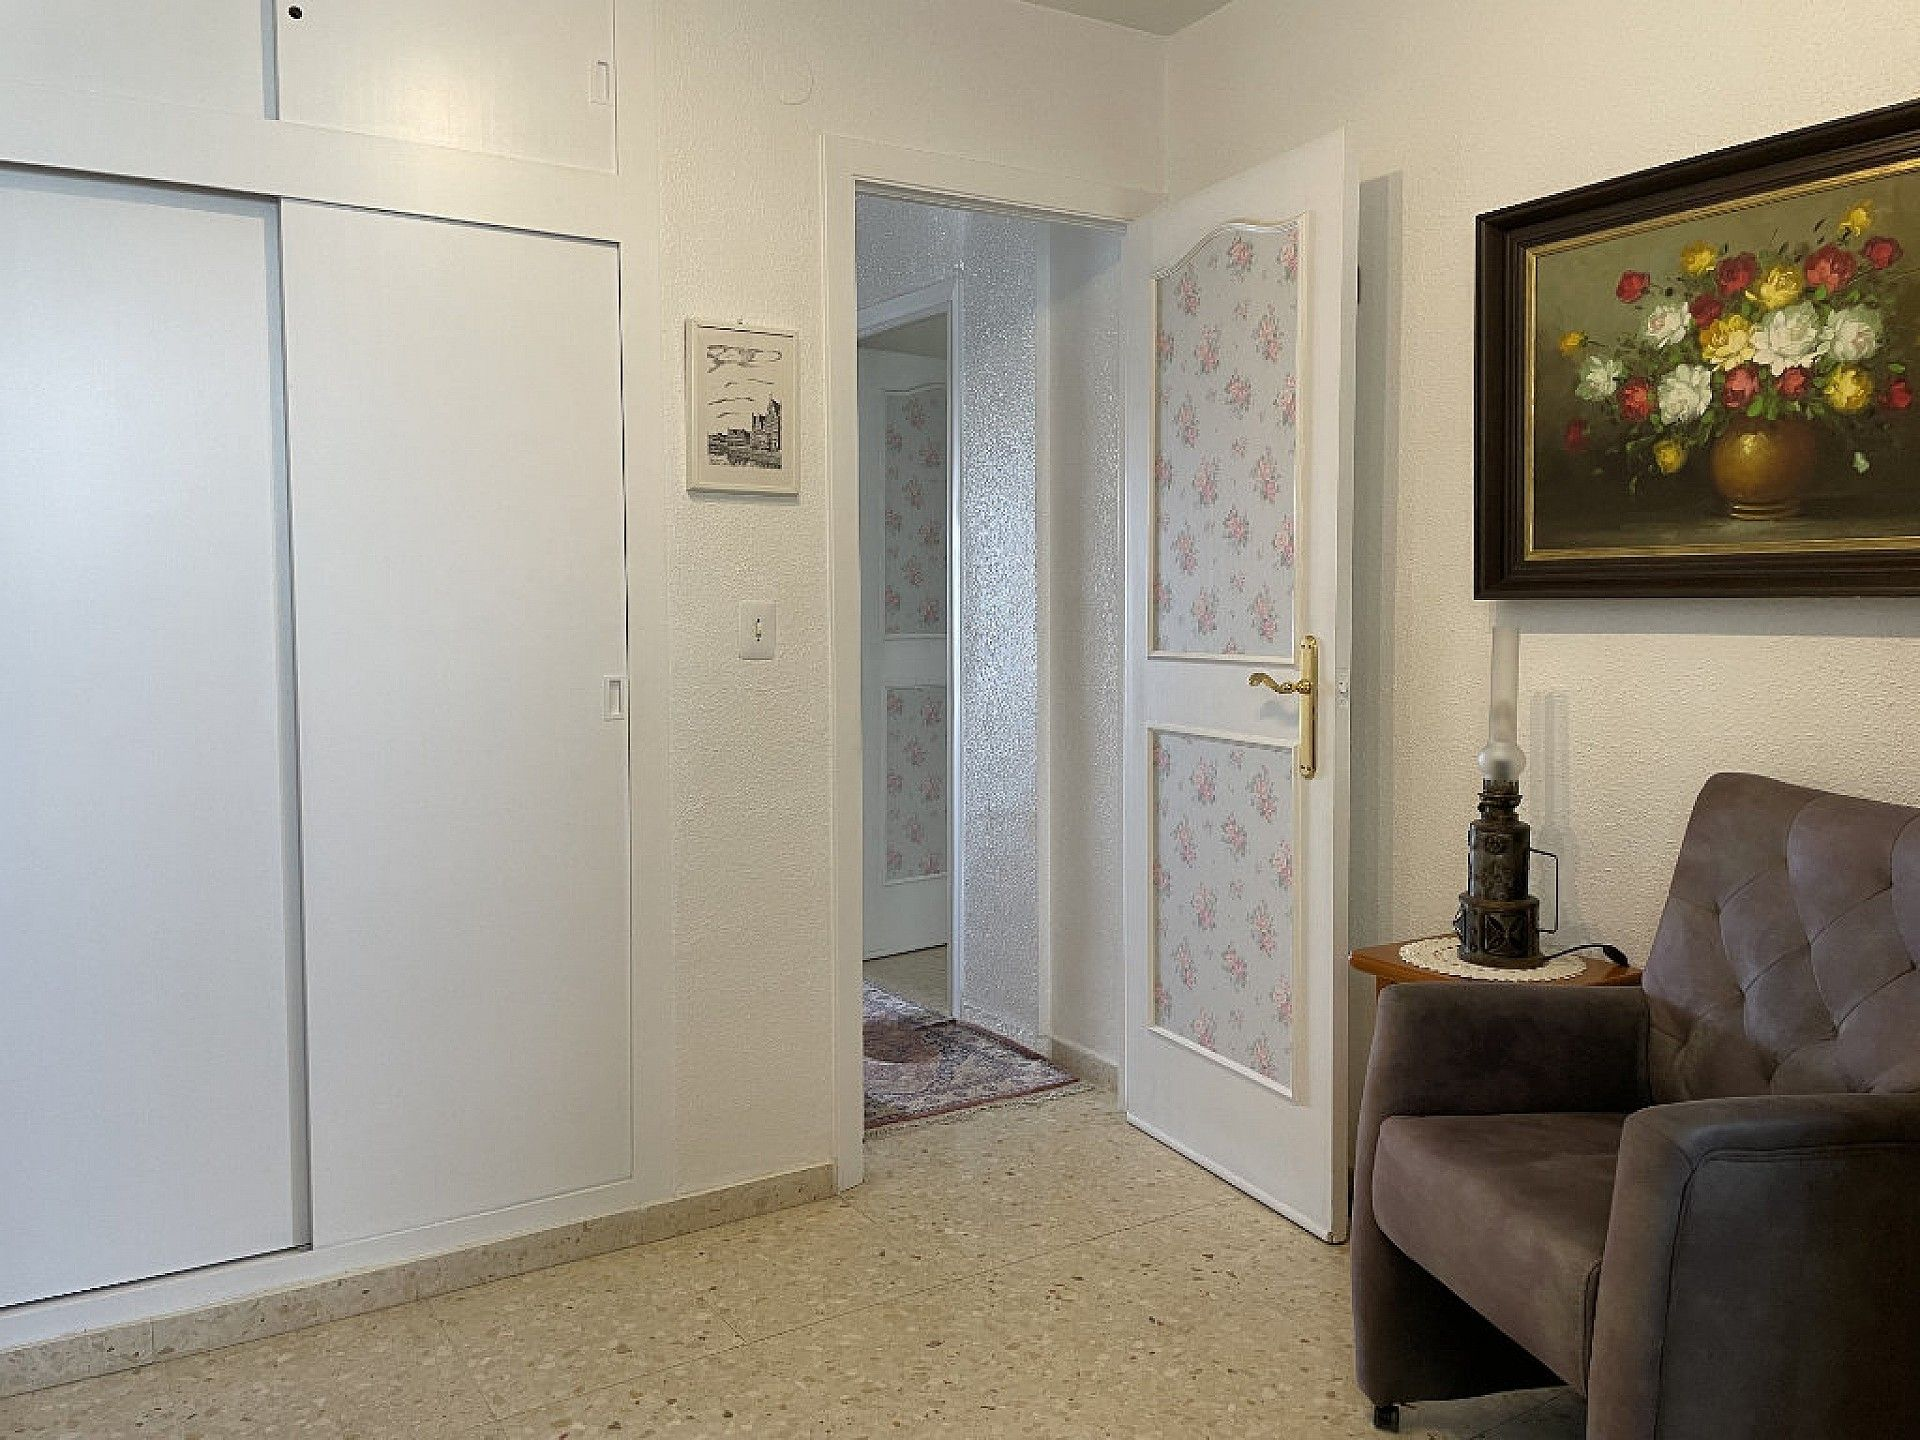 w_appartement-tekoop-costa-blanca-calpe-a1068-spanje13.jpg